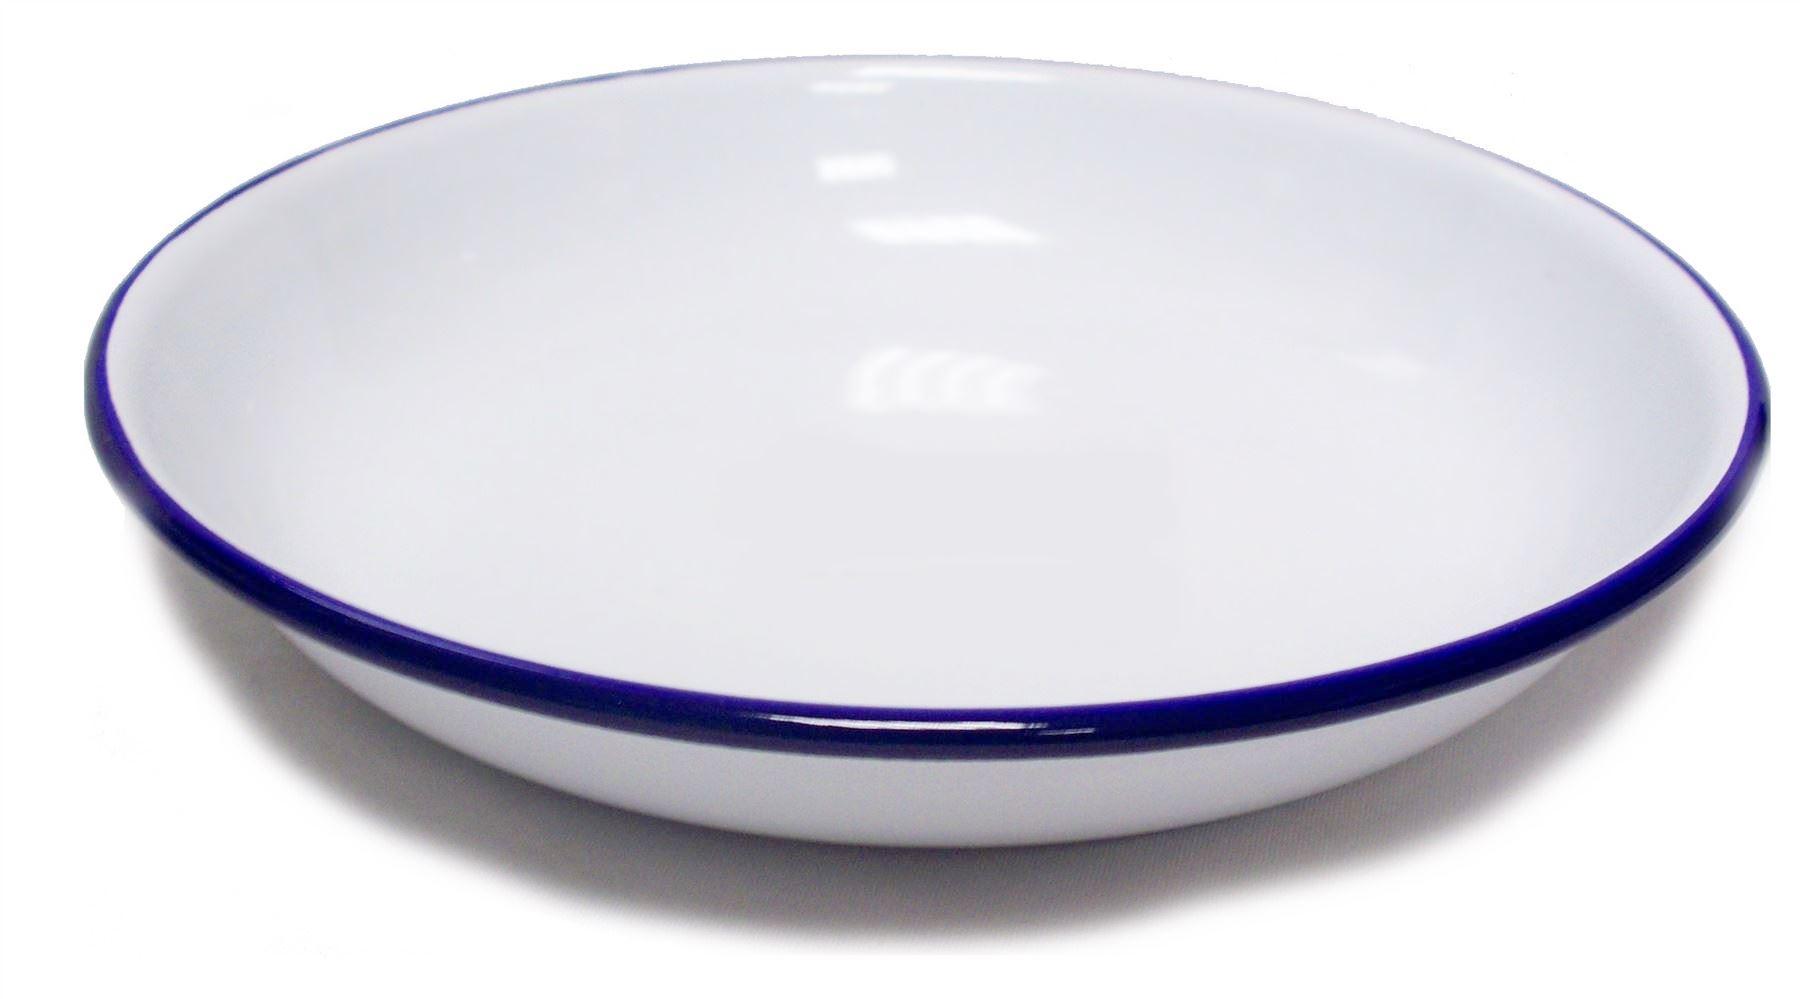 24cm Enamel Rice Pasta Plate